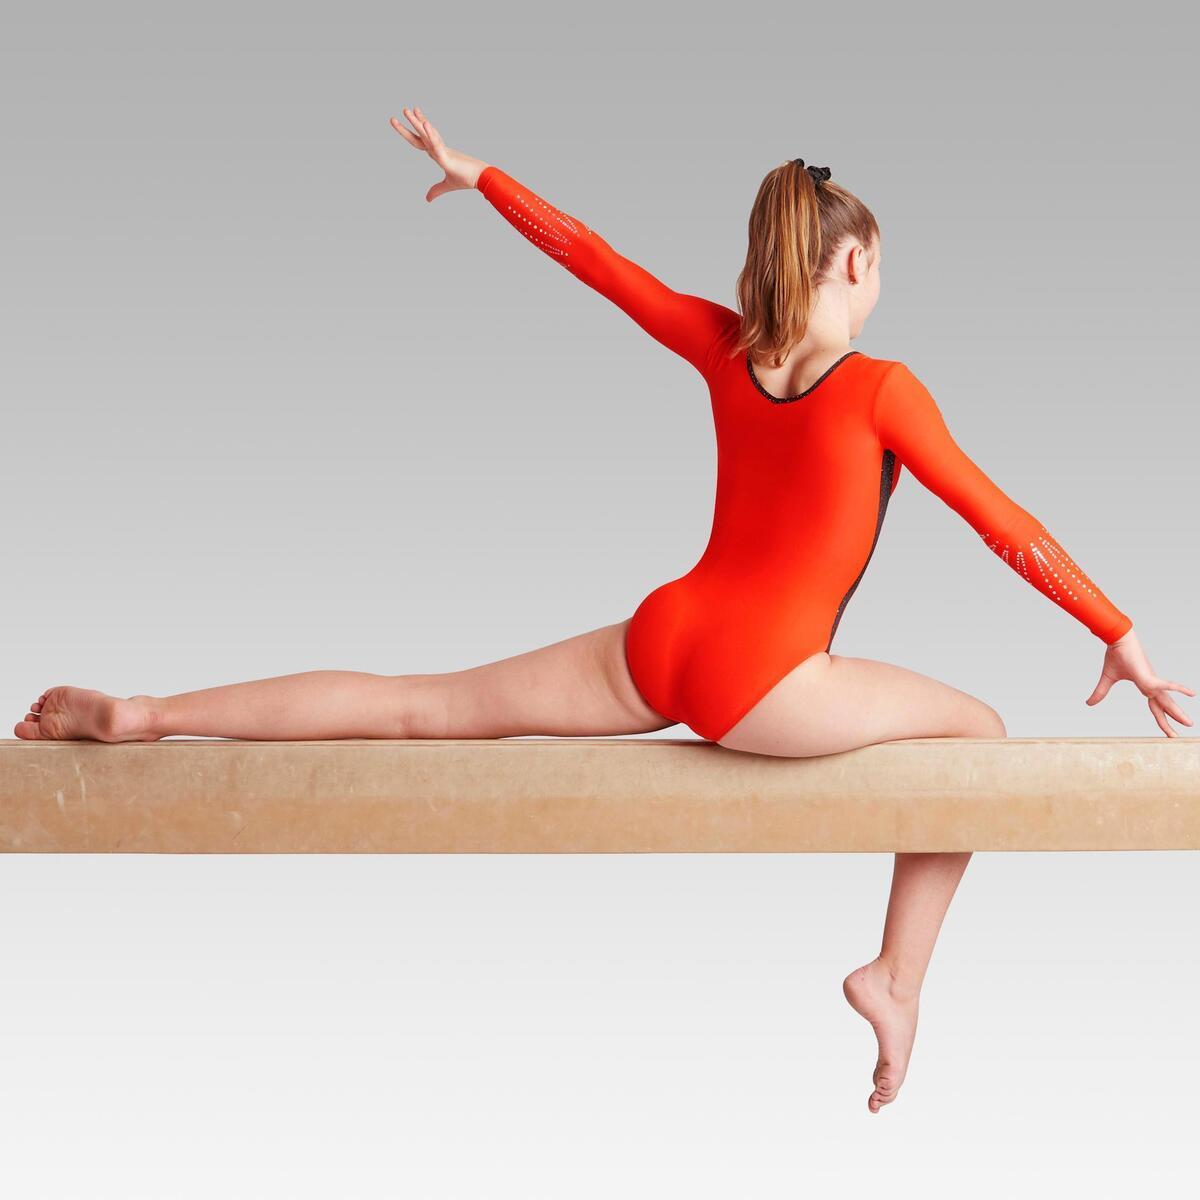 Bild 3 von Gymnastikanzug Turnanzug langarm 500 rot